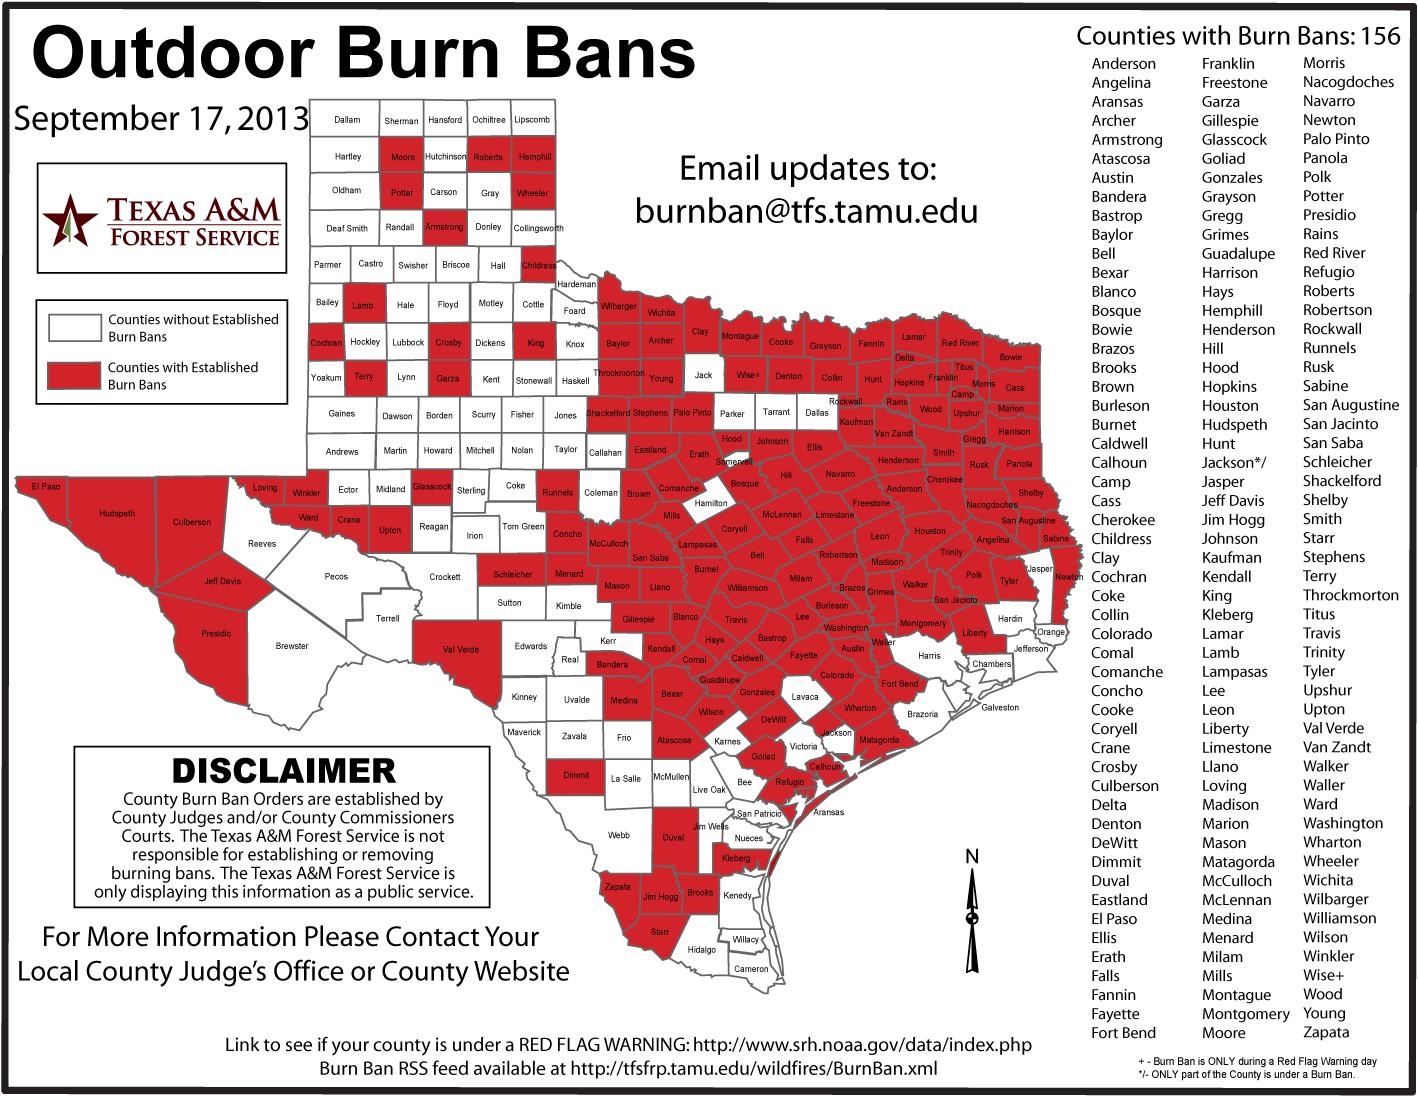 Texas County Burn Ban Map   Business Ideas 2013 - Burn Ban Map Of Texas